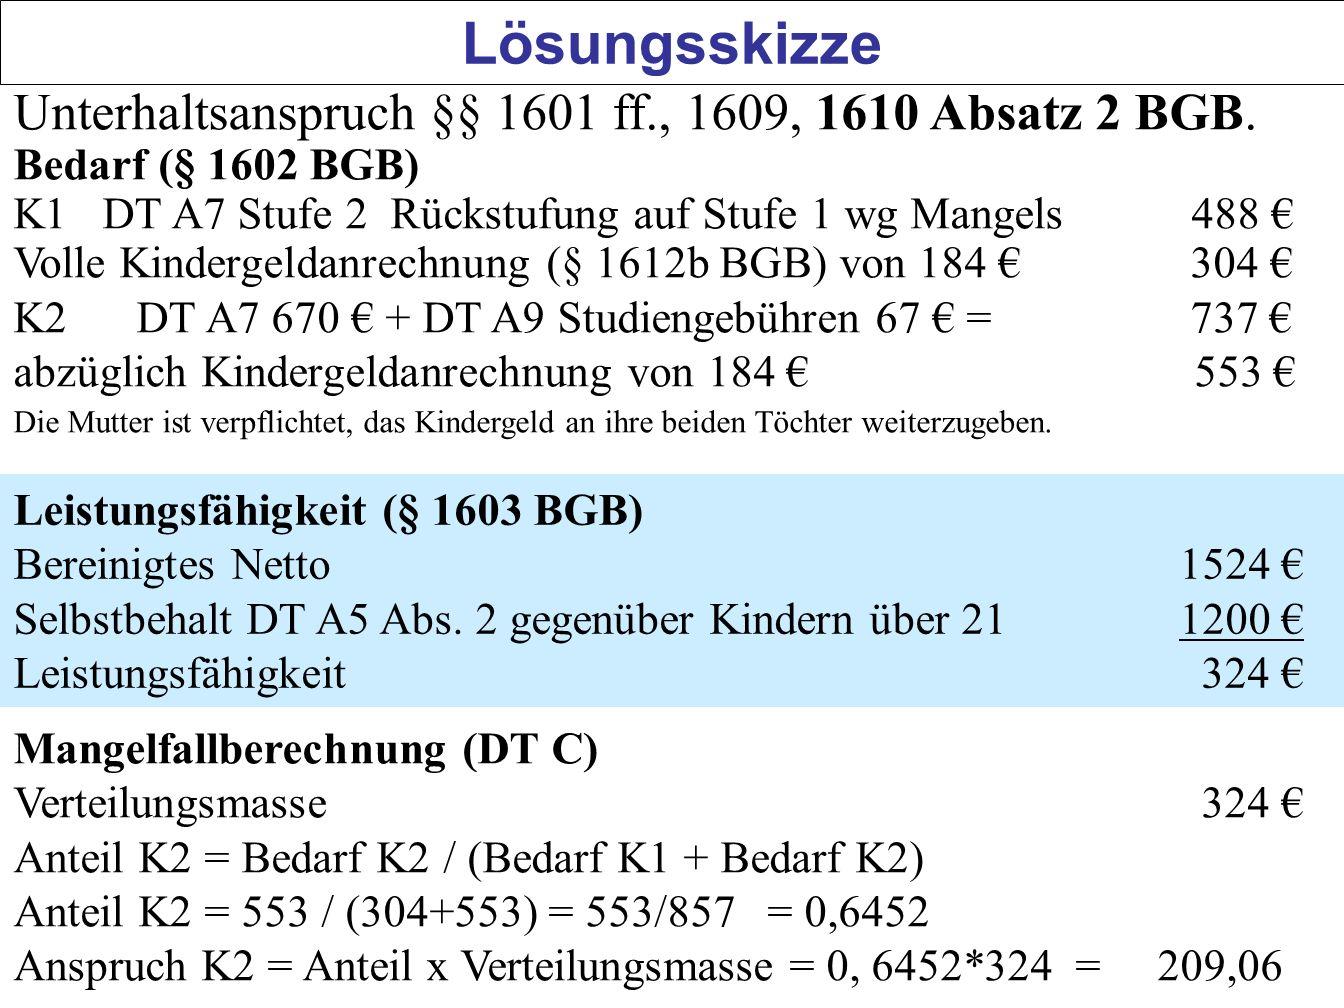 166 Lösungsskizze Unterhaltsanspruch §§ 1601 ff., 1609, 1610 Absatz 2 BGB. Bedarf (§ 1602 BGB) K1 DT A7 Stufe 2 Rückstufung auf Stufe 1 wg Mangels 488